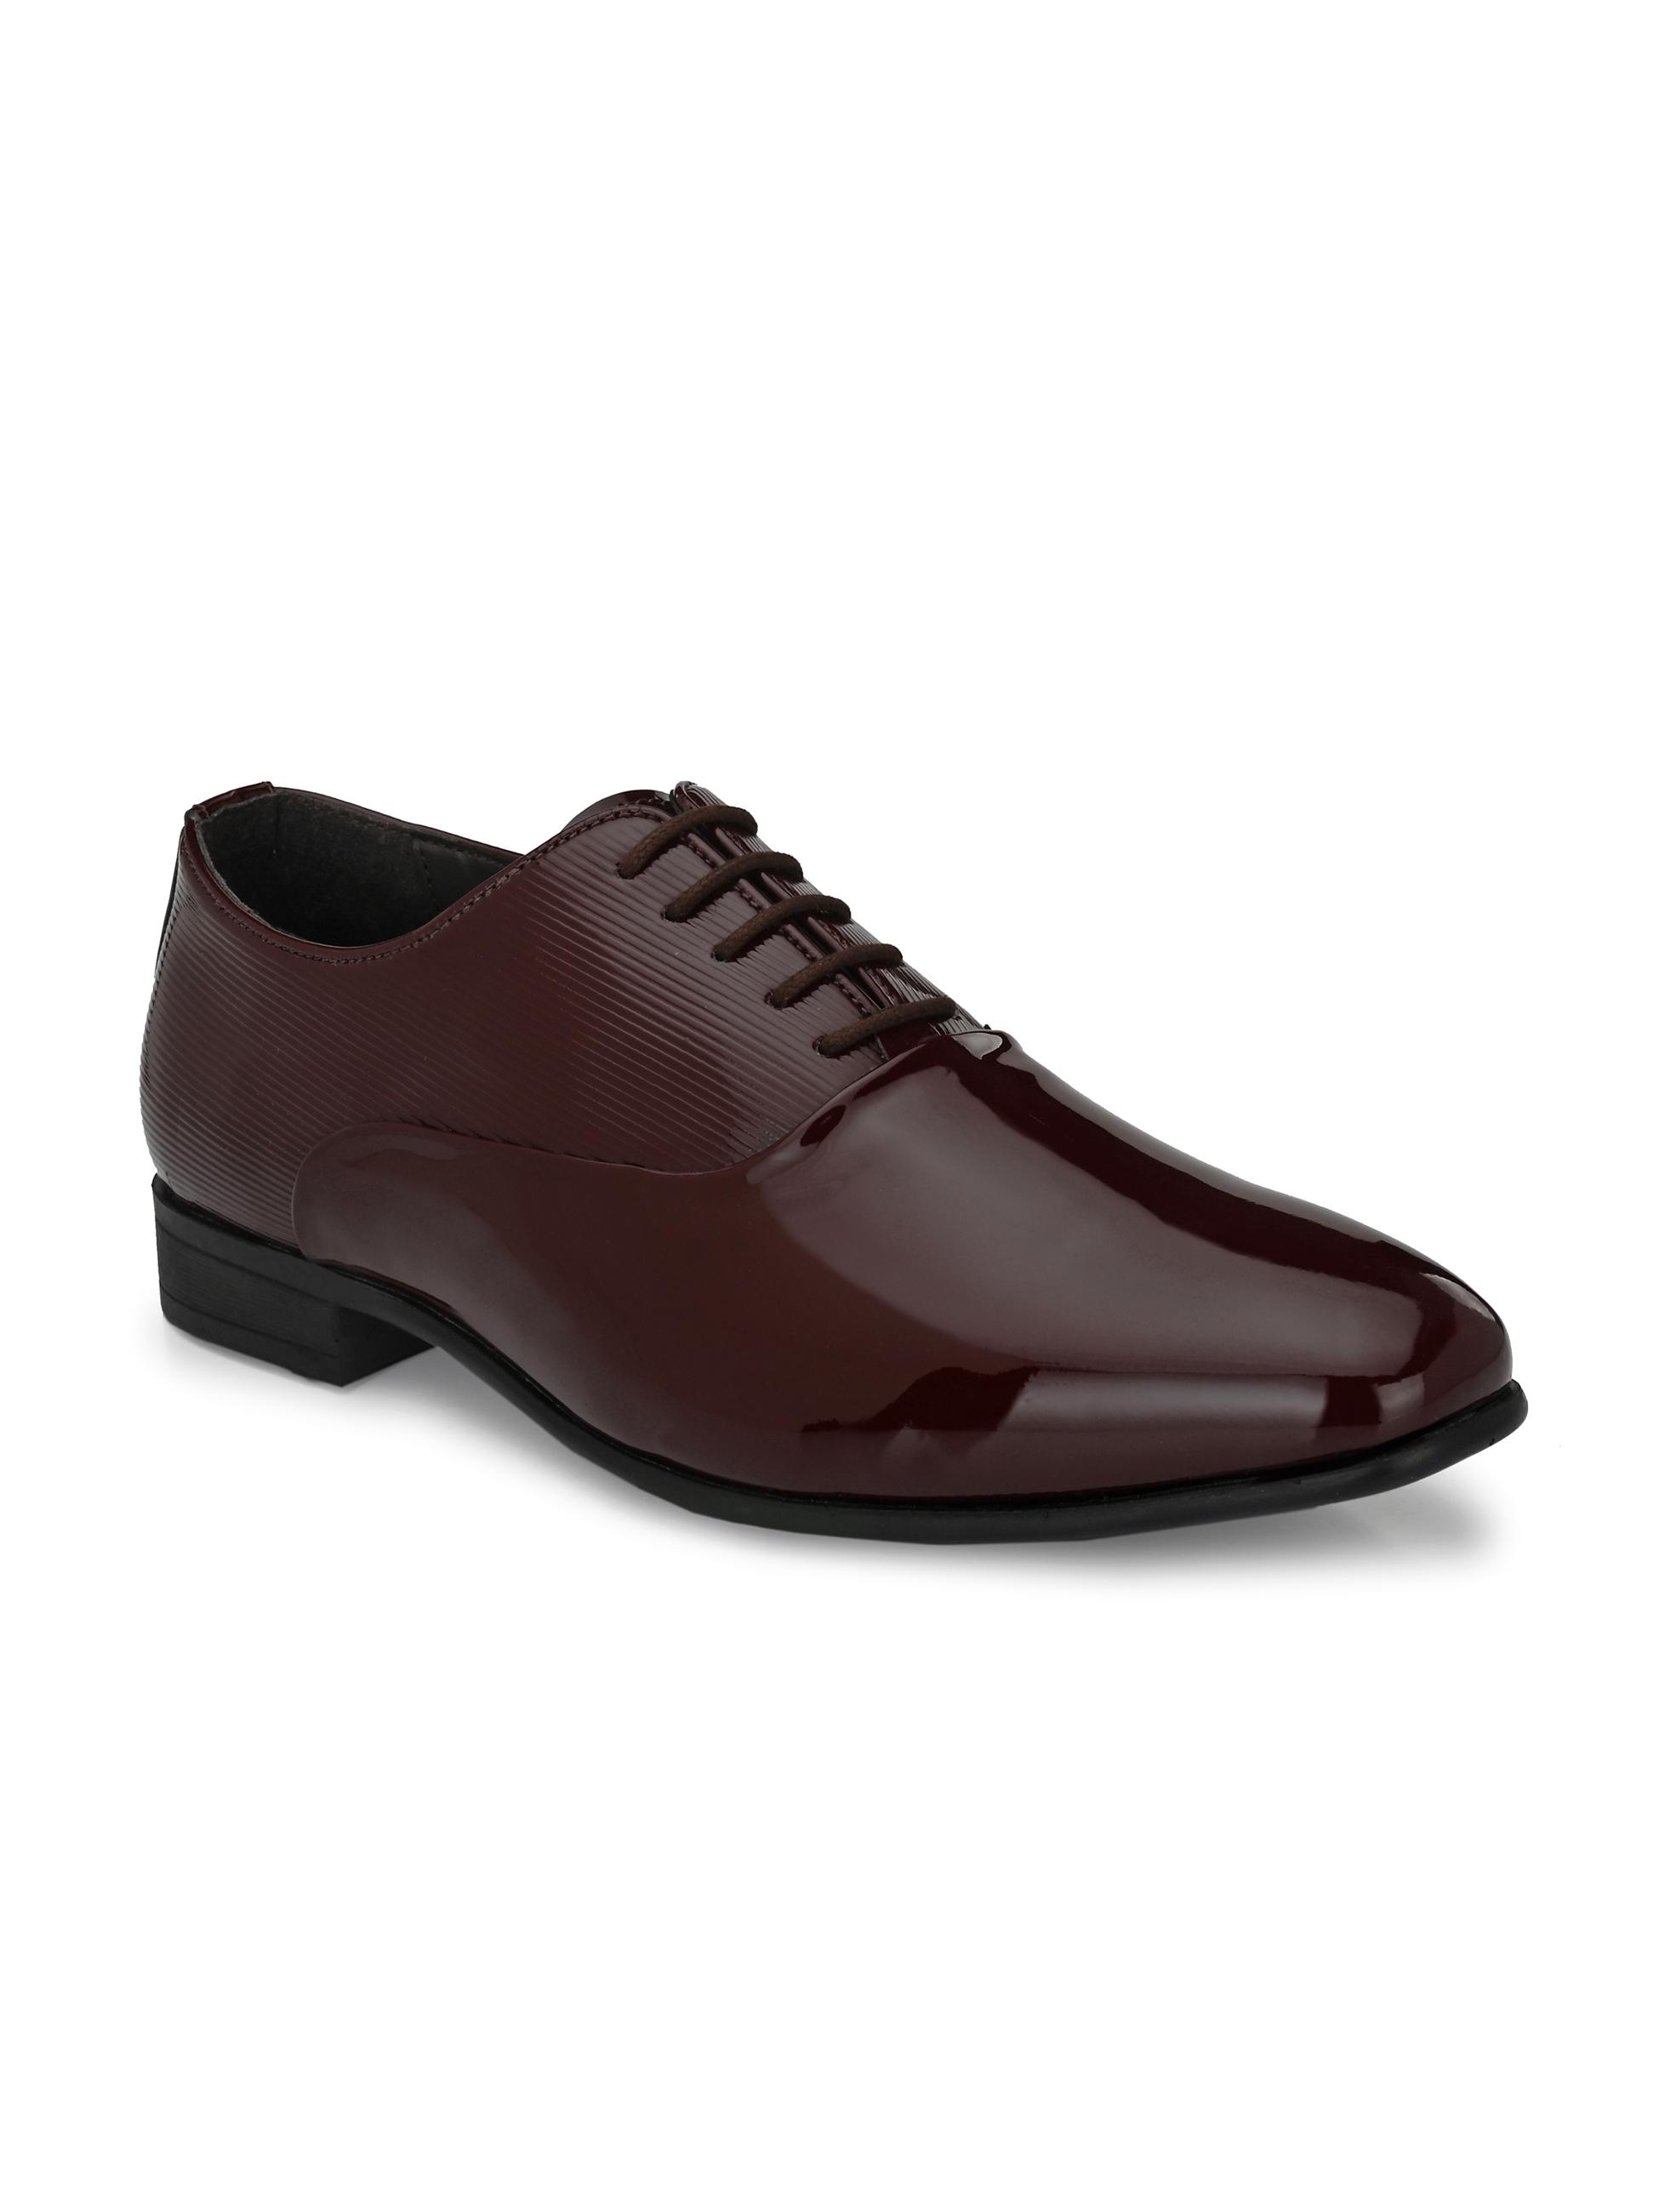 San Frissco | San Frissco Men Roman Cherry Patent Oxfords Faux Leather Oxford